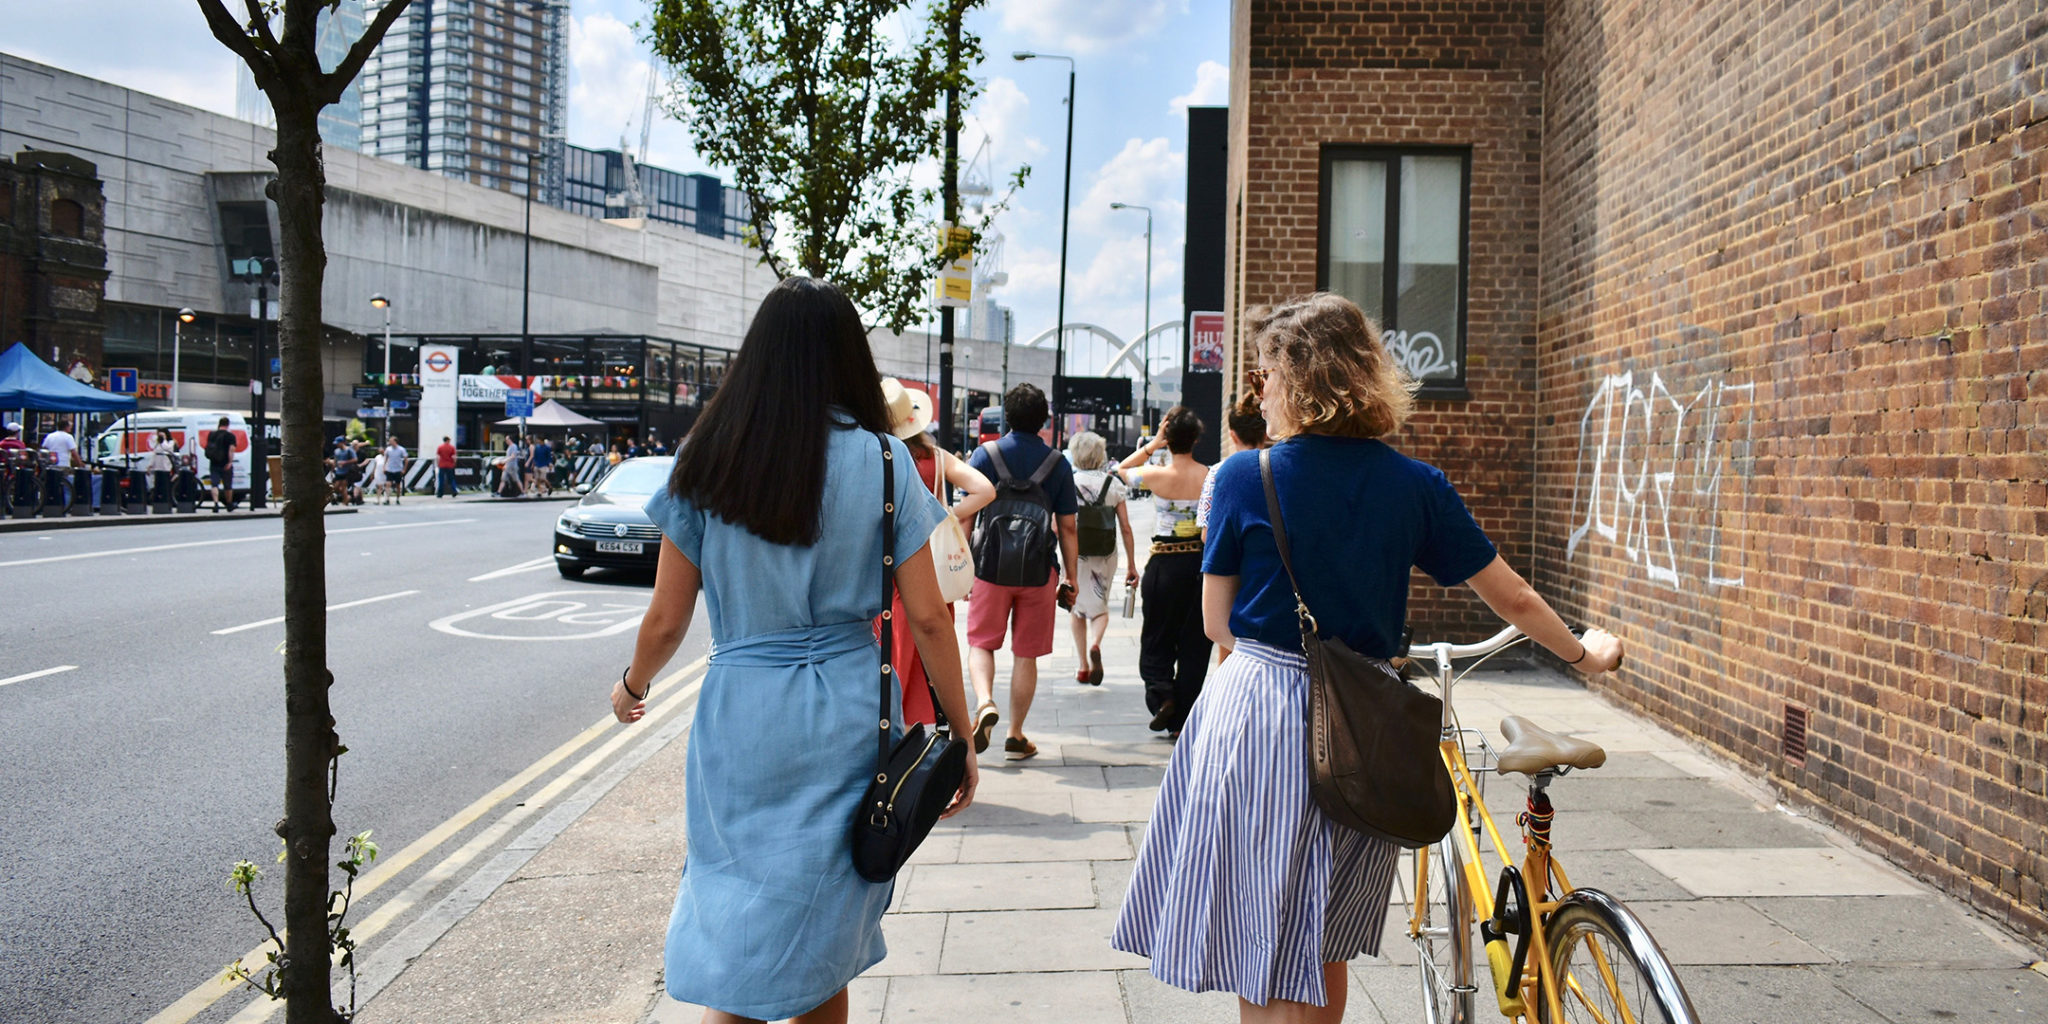 New London Architecture Walking Tour – Shoreditch